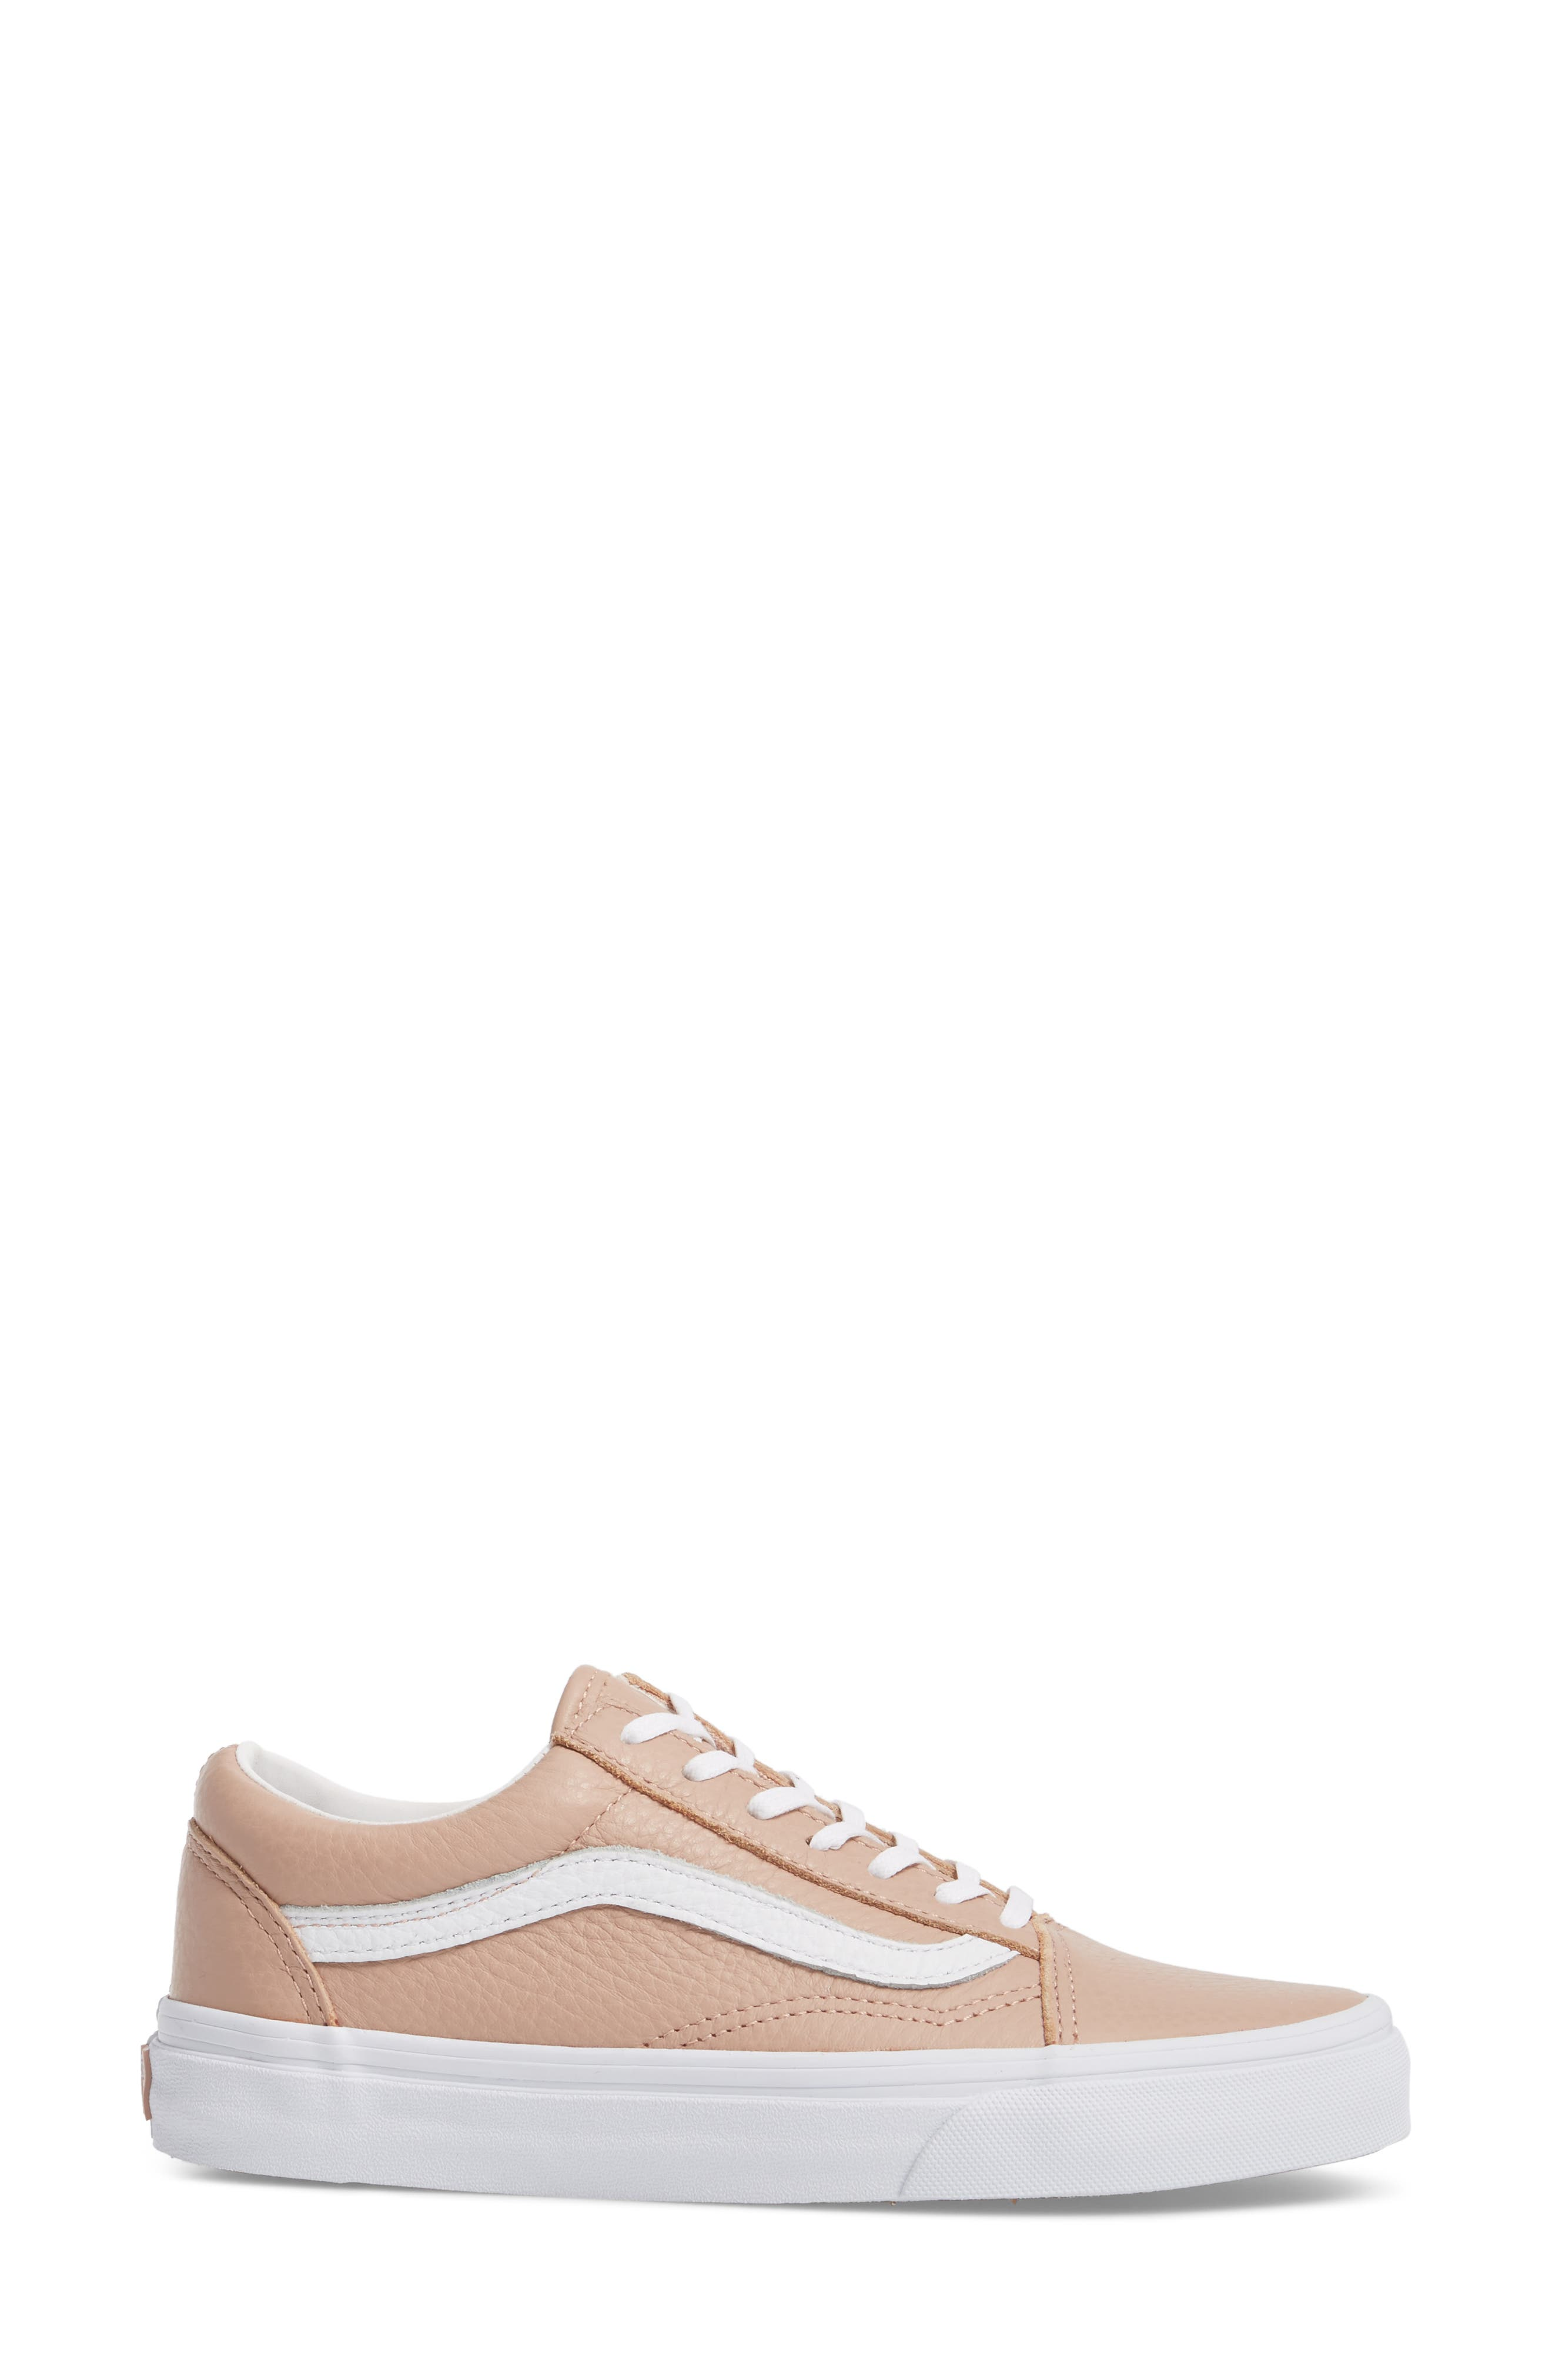 Old Skool DX Sneaker,                             Alternate thumbnail 3, color,                             652